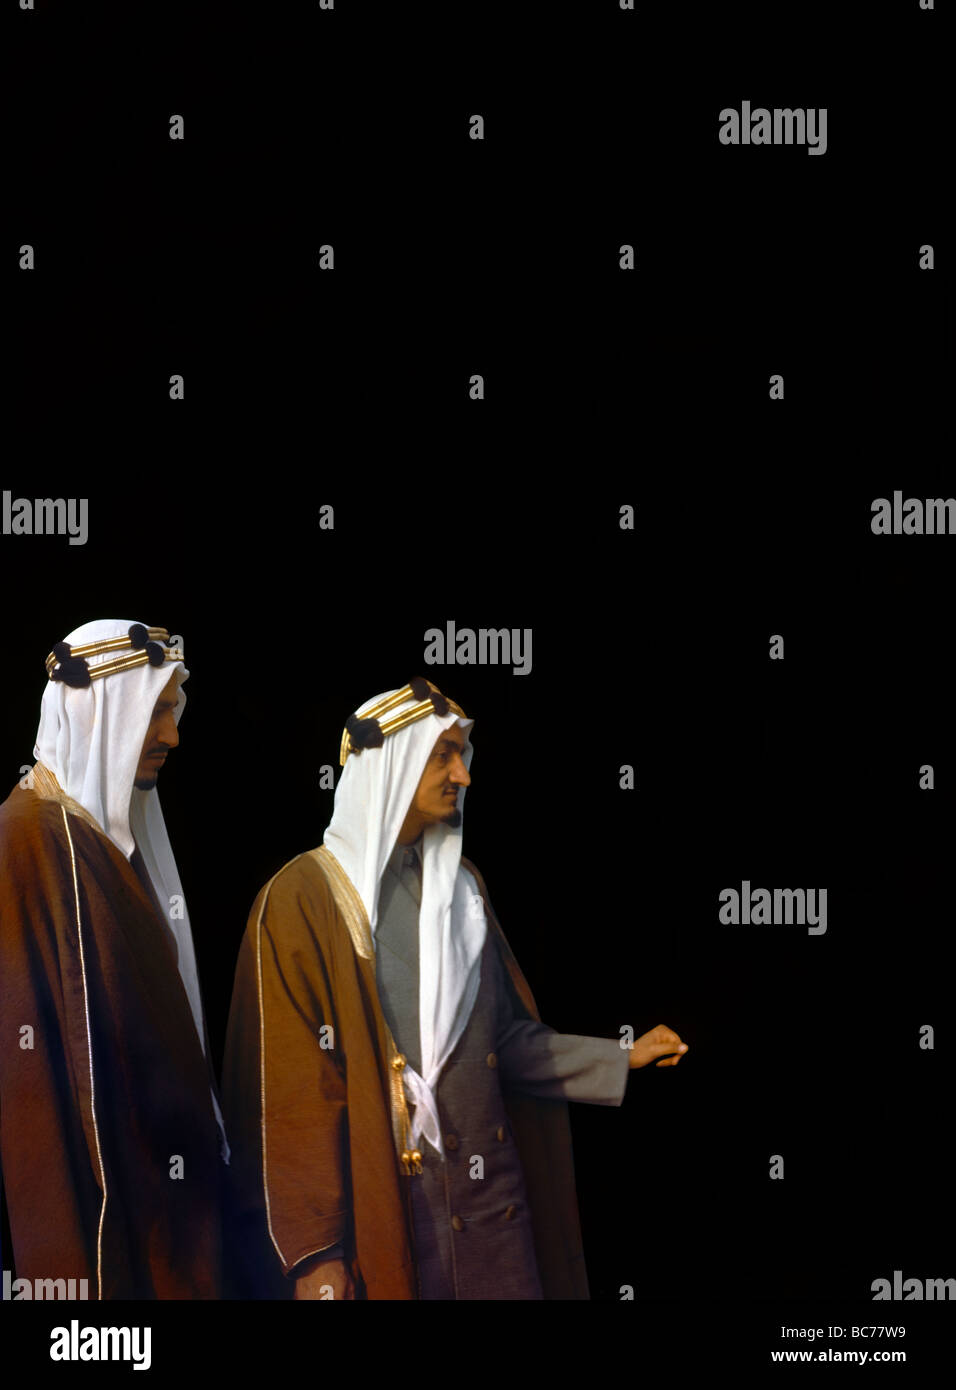 Saudi Arabia King Faisal Bin Abdul Aziz - Stock Image